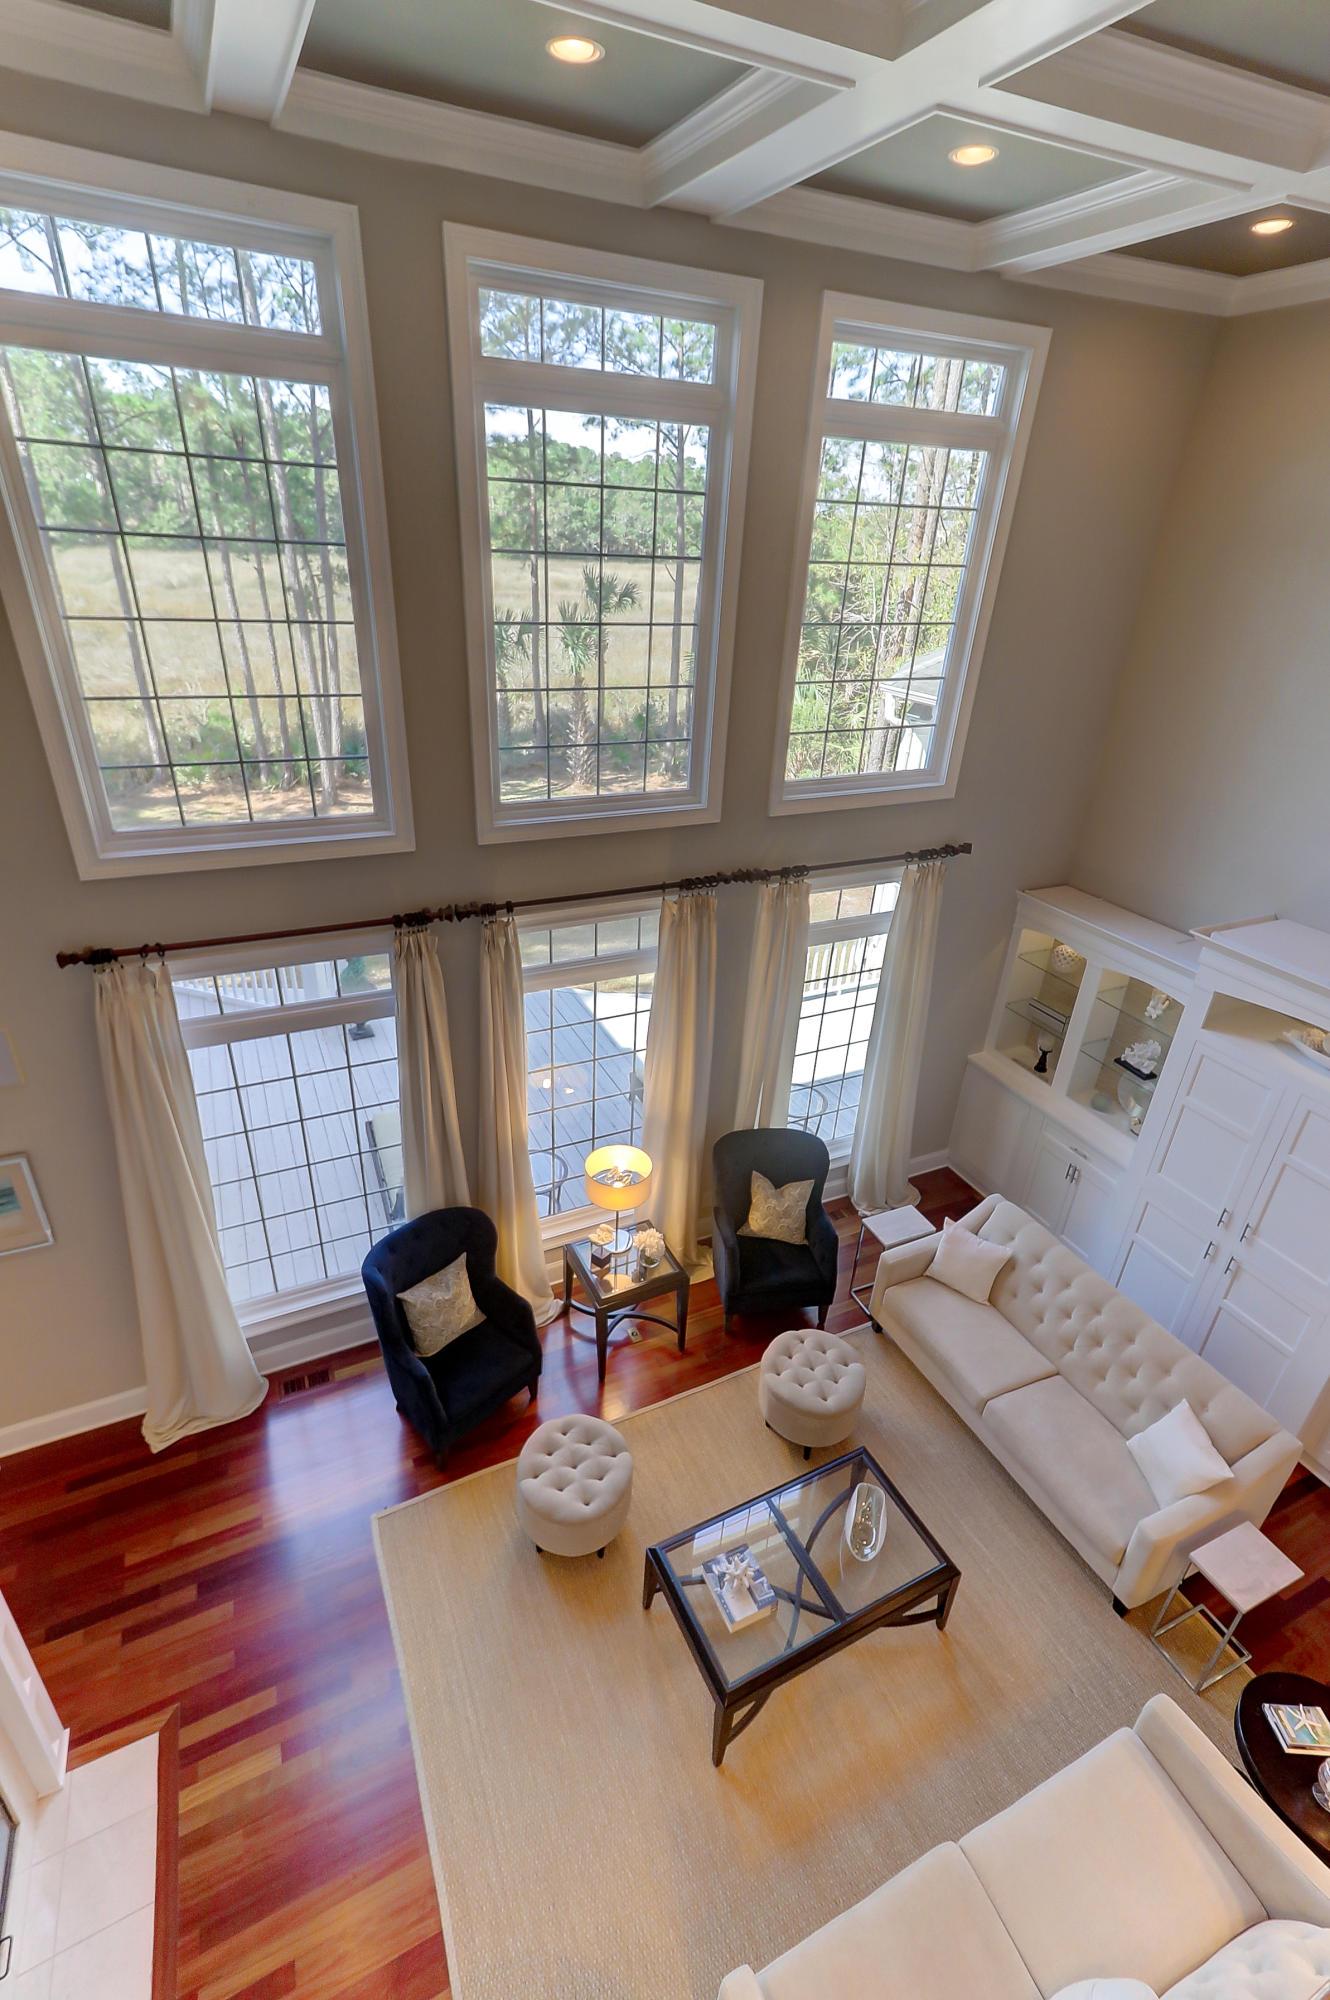 Dunes West Homes For Sale - 2996 Pignatelli Crescent, Mount Pleasant, SC - 90